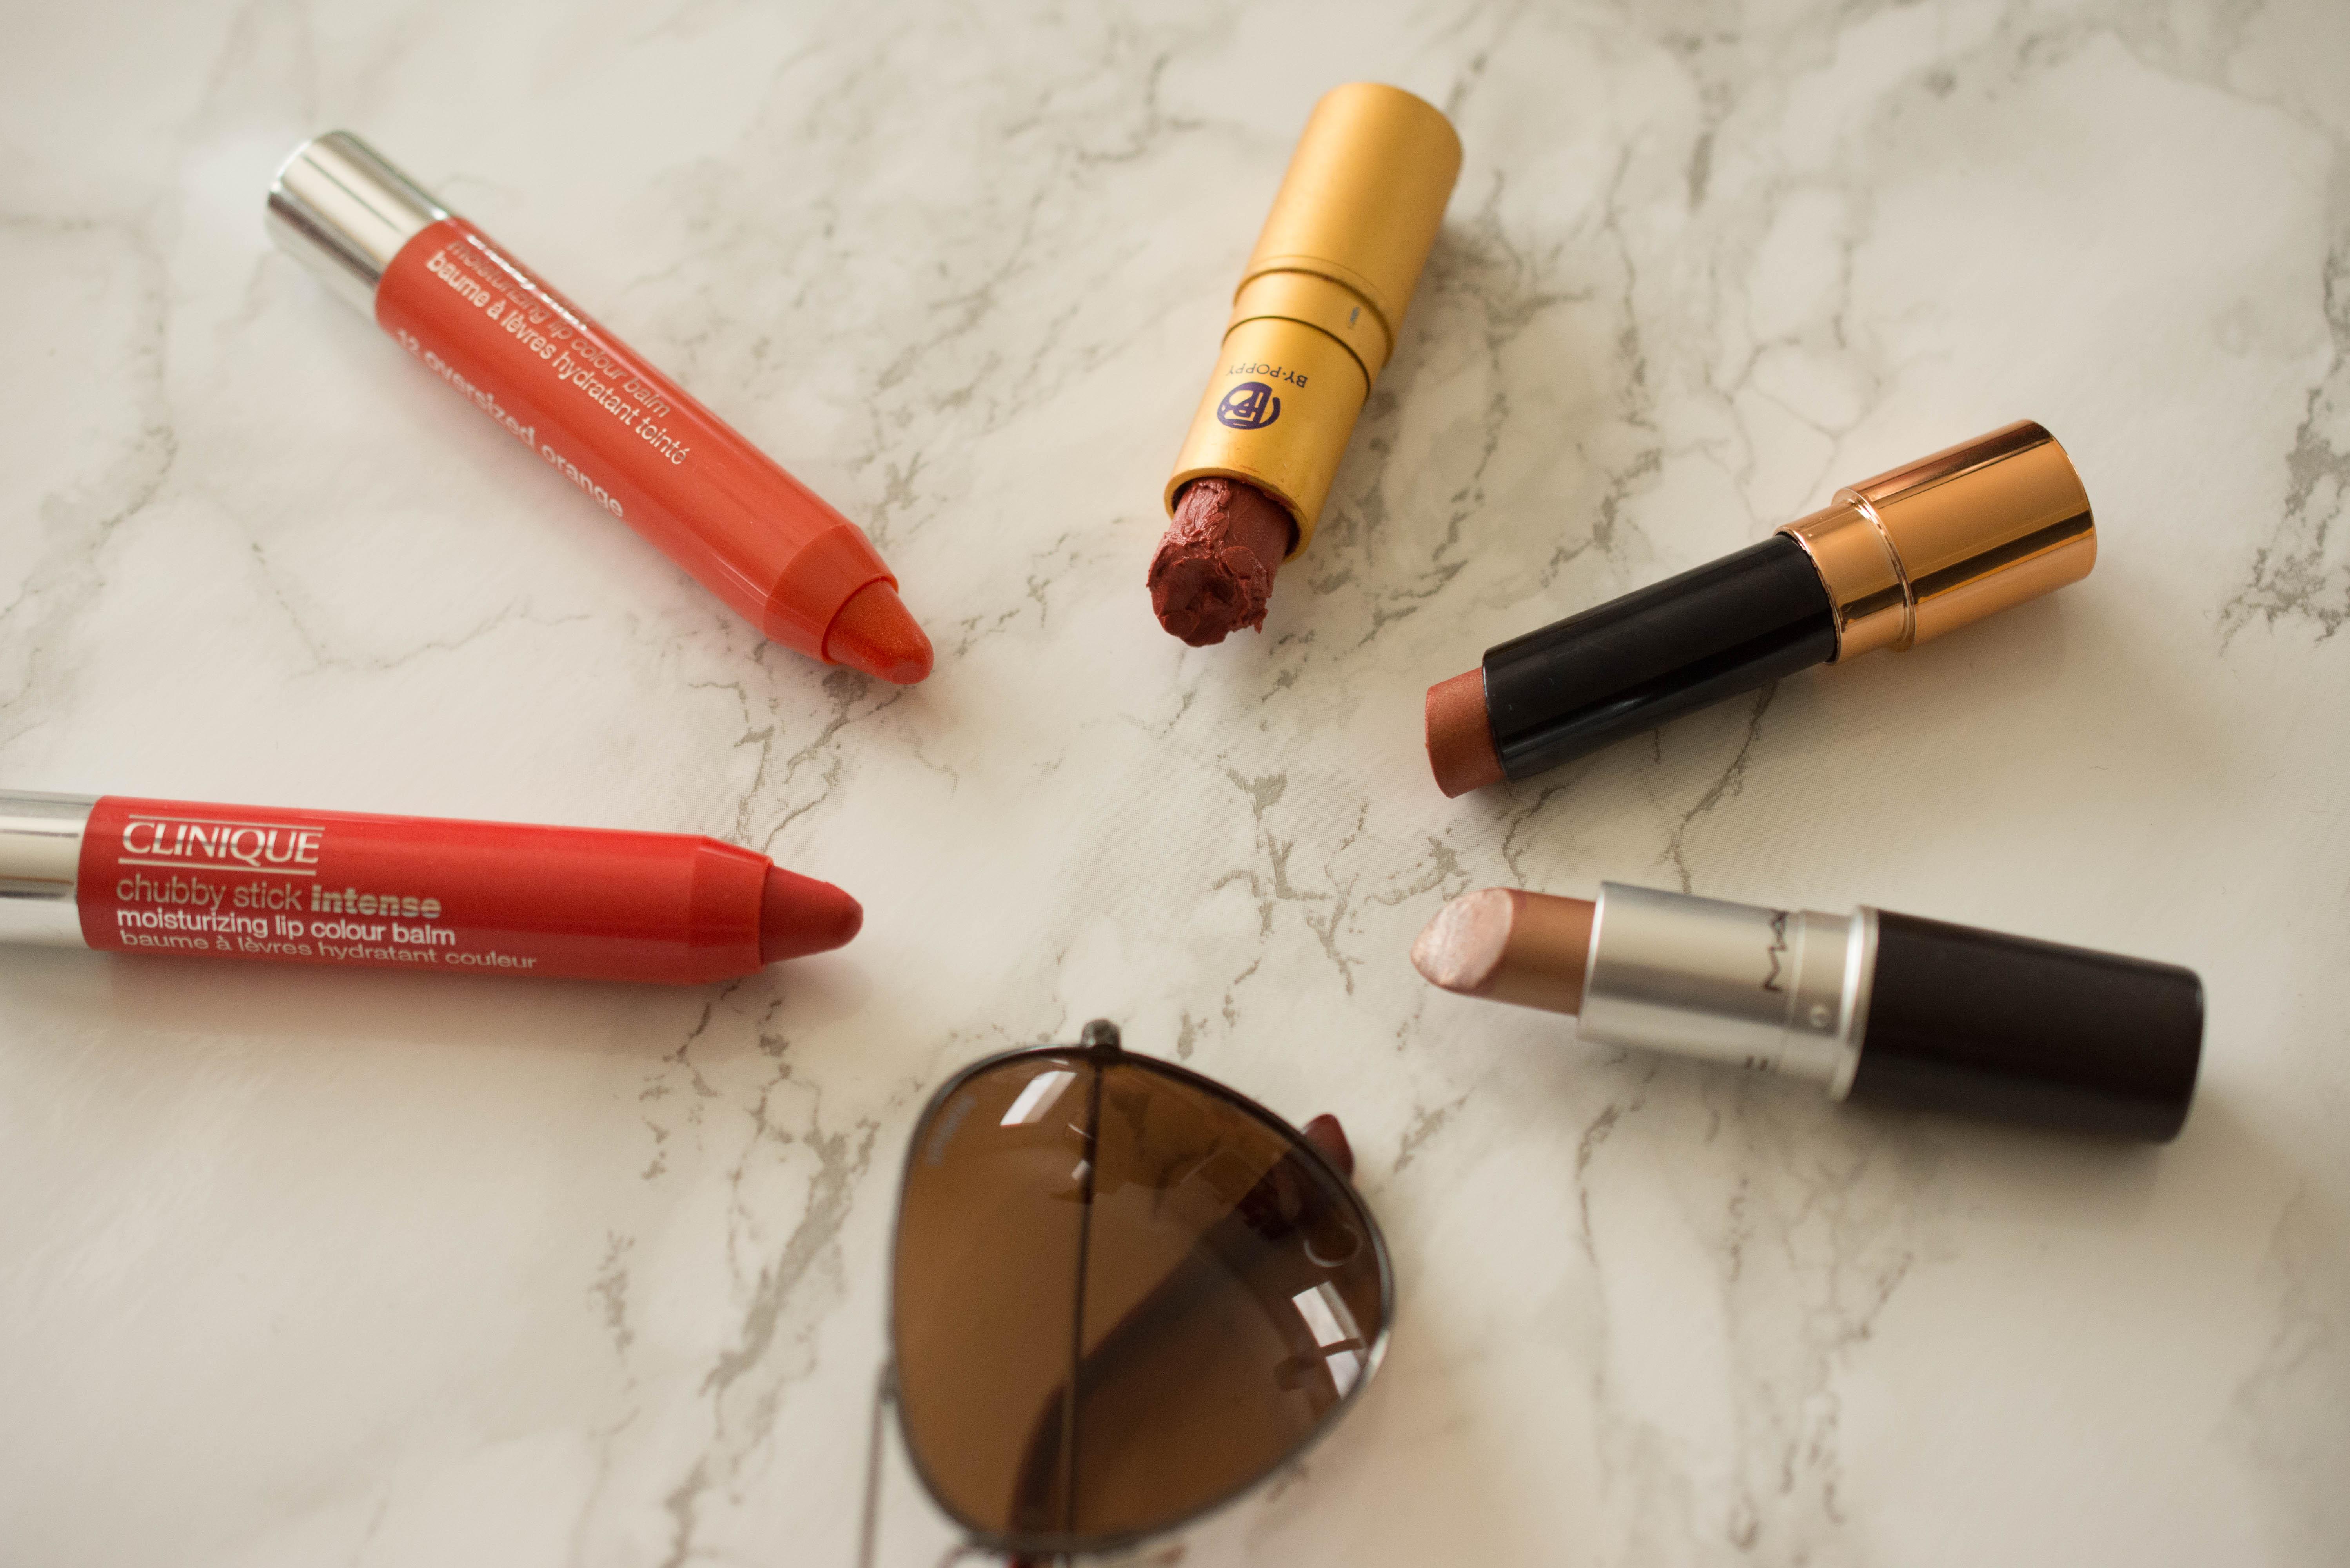 Seasonal Challenge Summer 2016 - The lipsticks